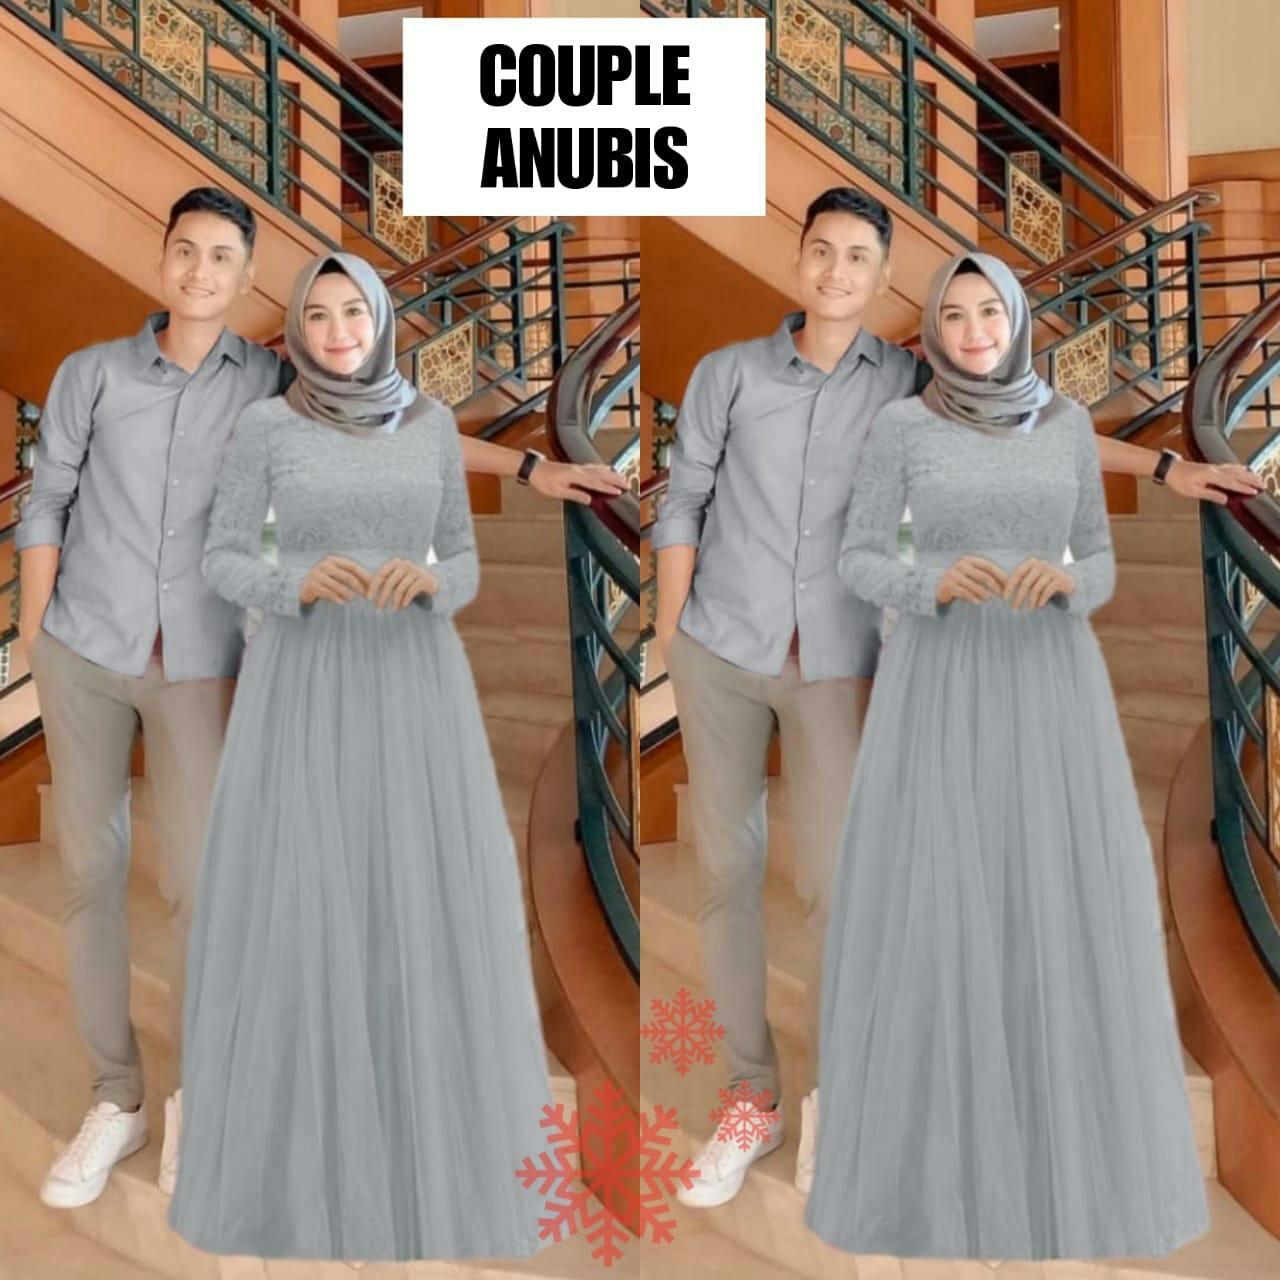 DoubleMM Fashion Cp Anubis - Pakaian Baju Couple Kemeja Pria & Gamis Wanita  Muslimah Gamis Brukat Tile Kemeja T-Shirt Polos Pria Baju Couple Pesta